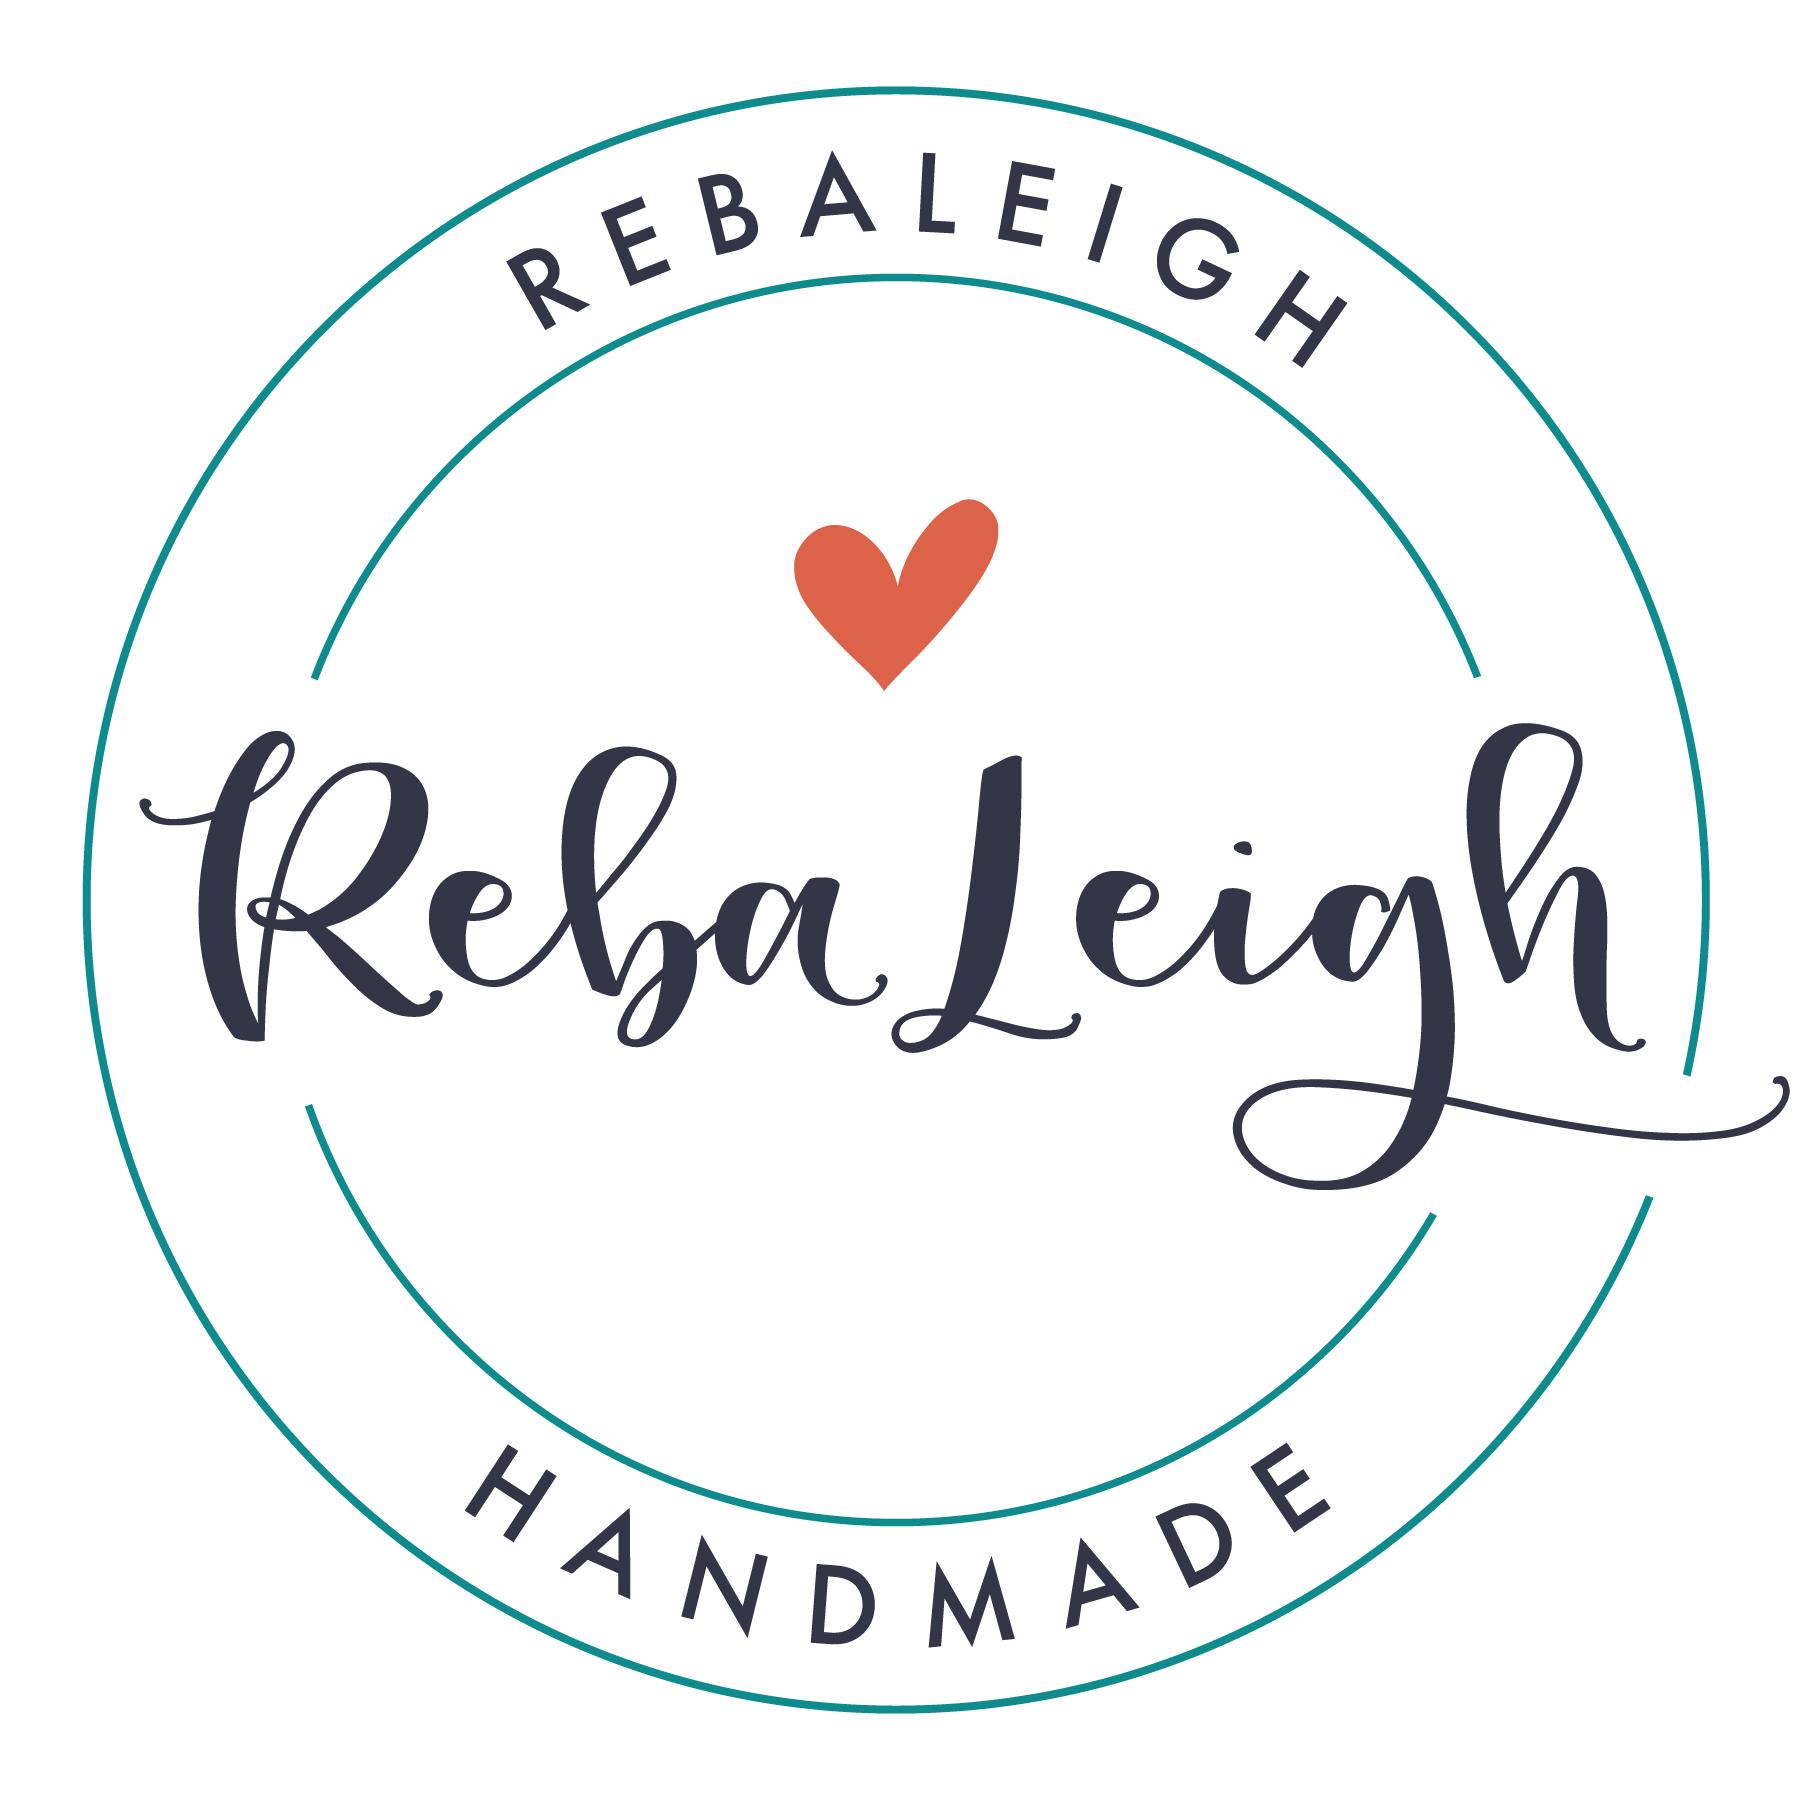 RebaLeigh Handmade